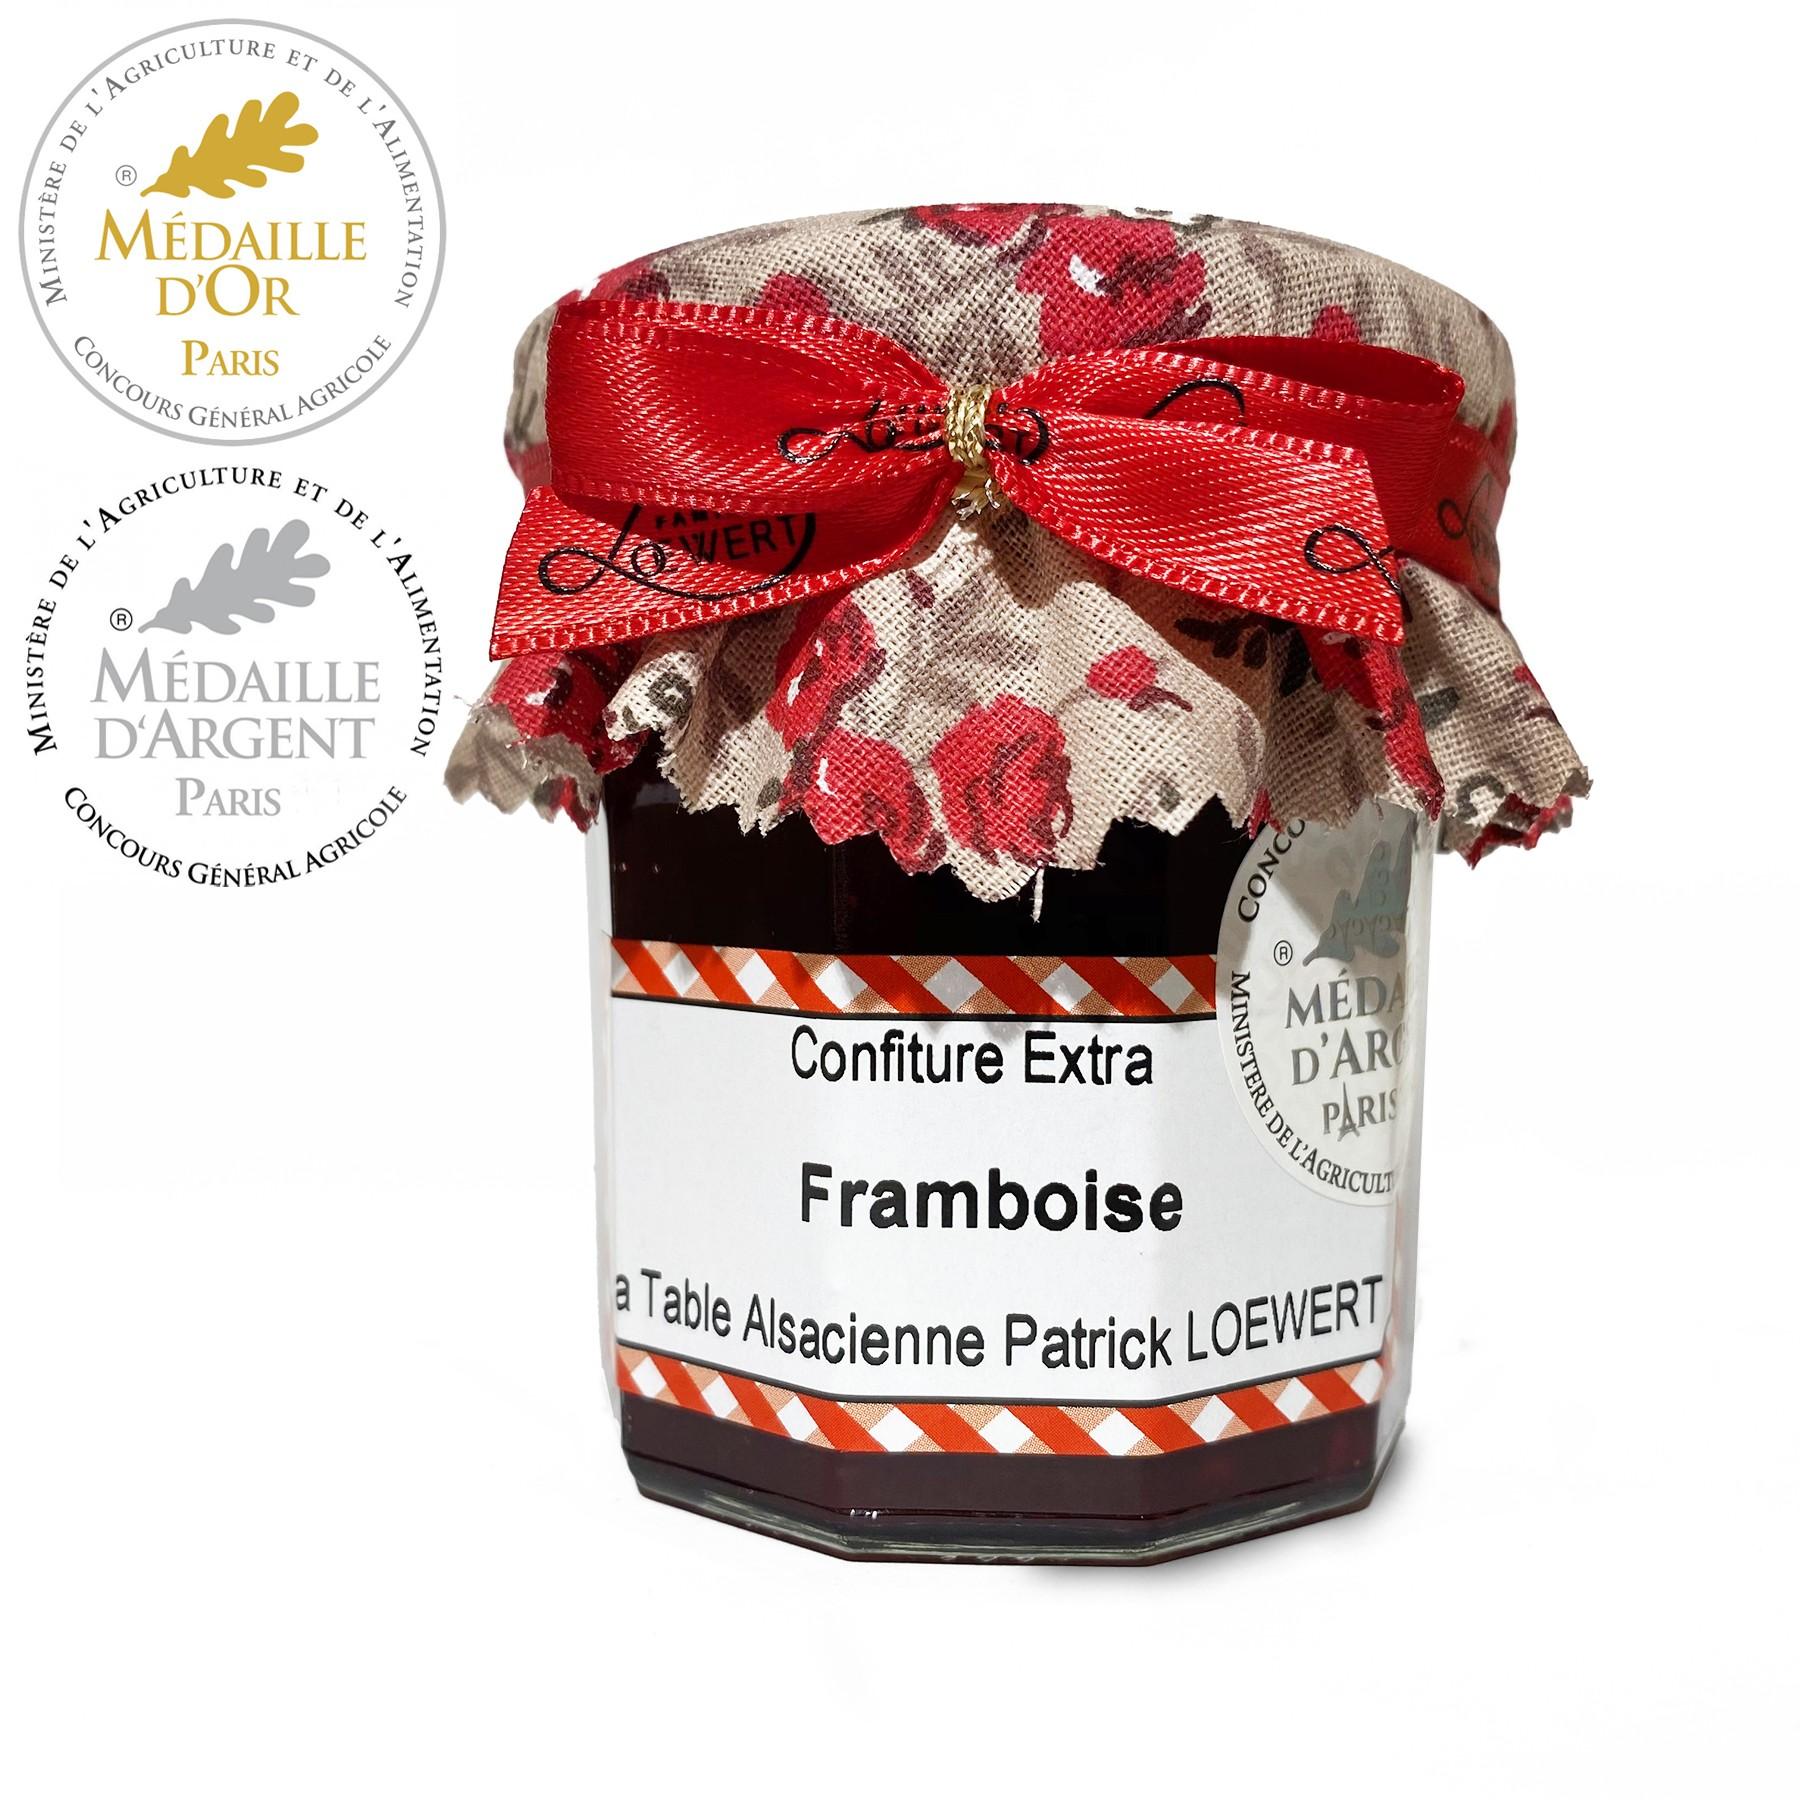 Framboise OR 2016 ARGENT...